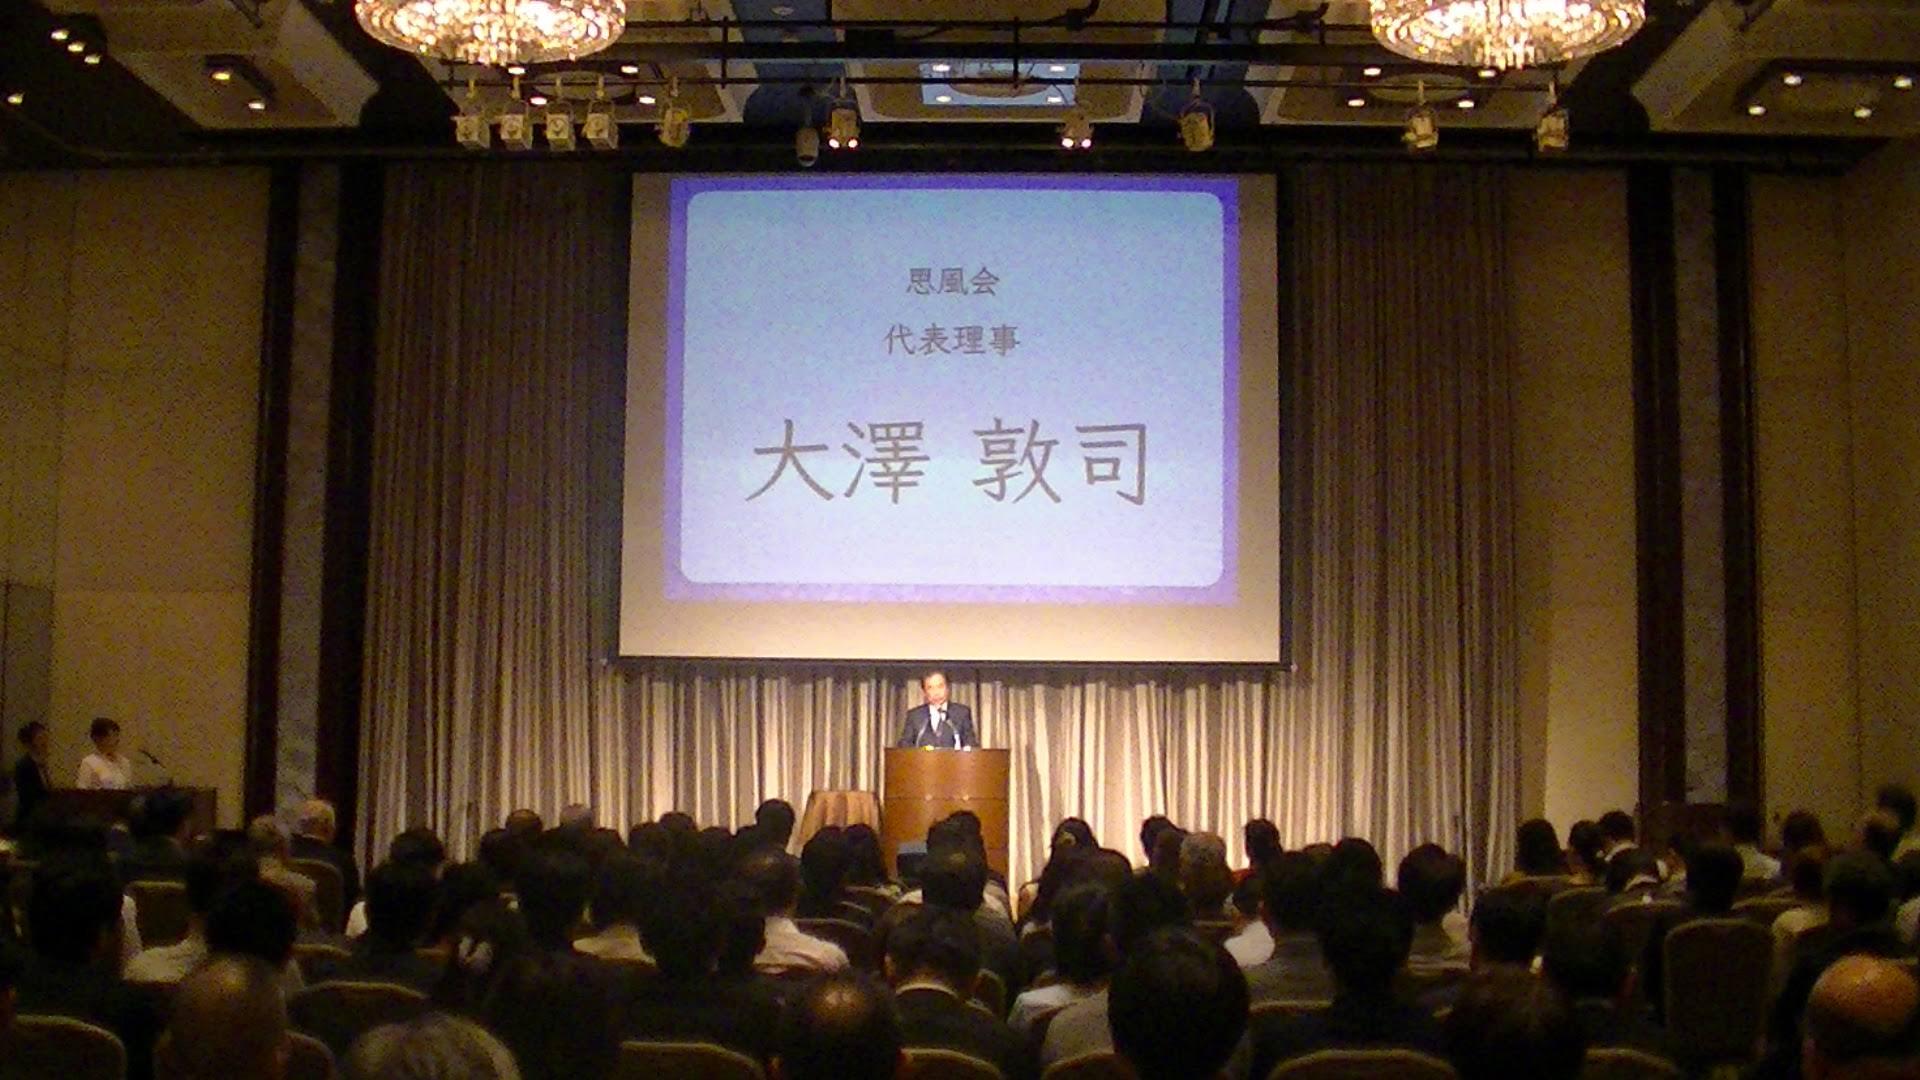 PIC 1617 1 - 思風会全国大会in広島